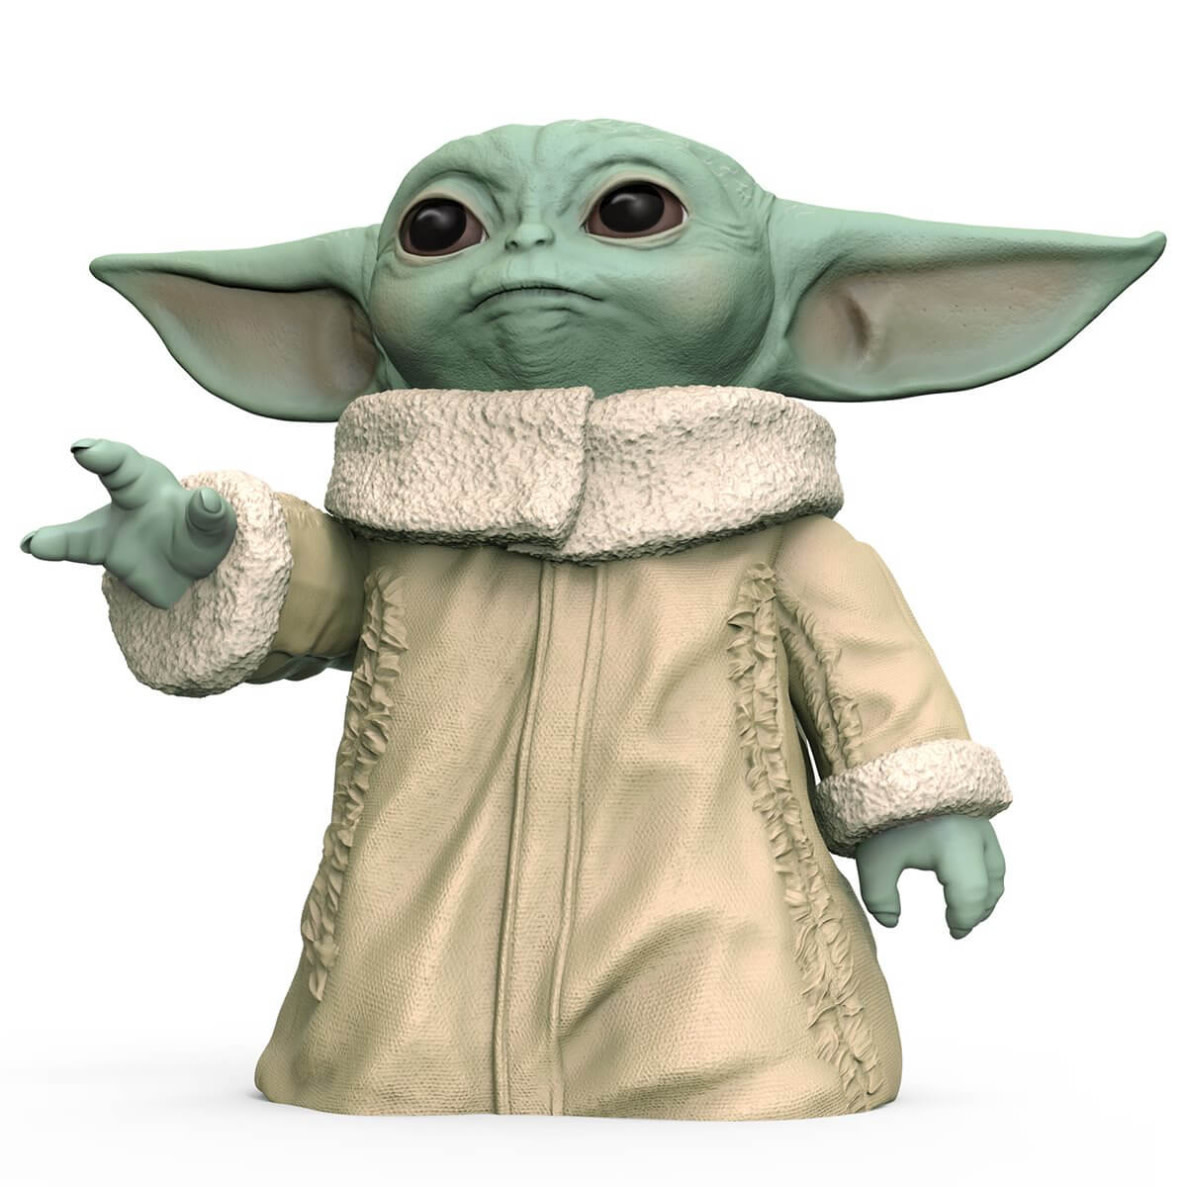 HASBRO Star Wars - The Mandalorian The Child Action Figure 16cm